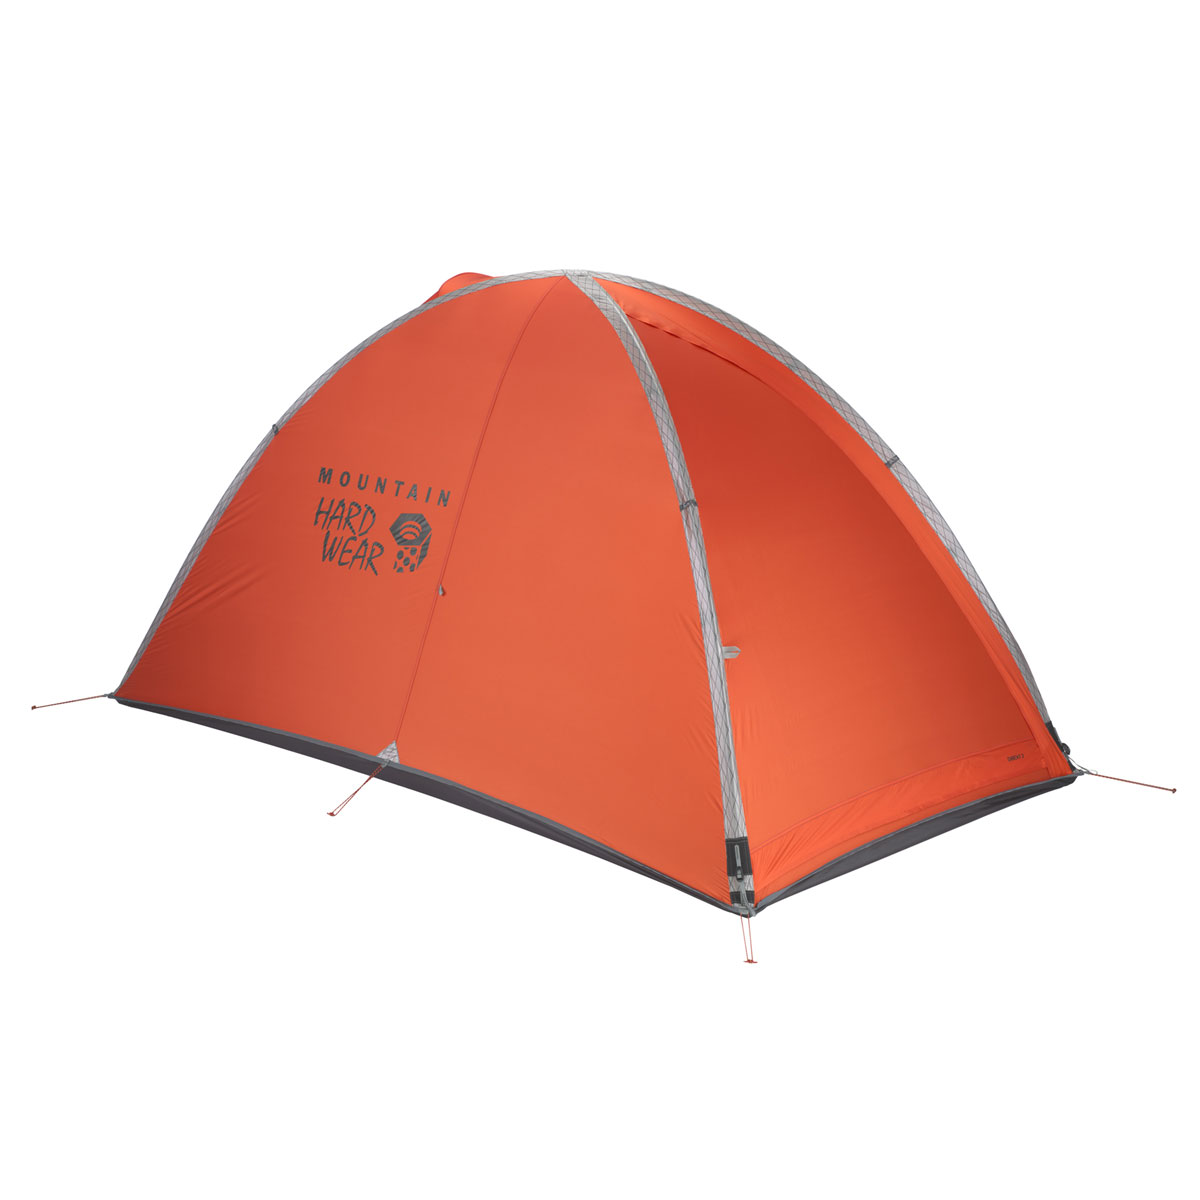 State Orange  sc 1 st  Moontrail & Mountain Hardwear Direkt 2 (free ground shipping) :: 4-season ...